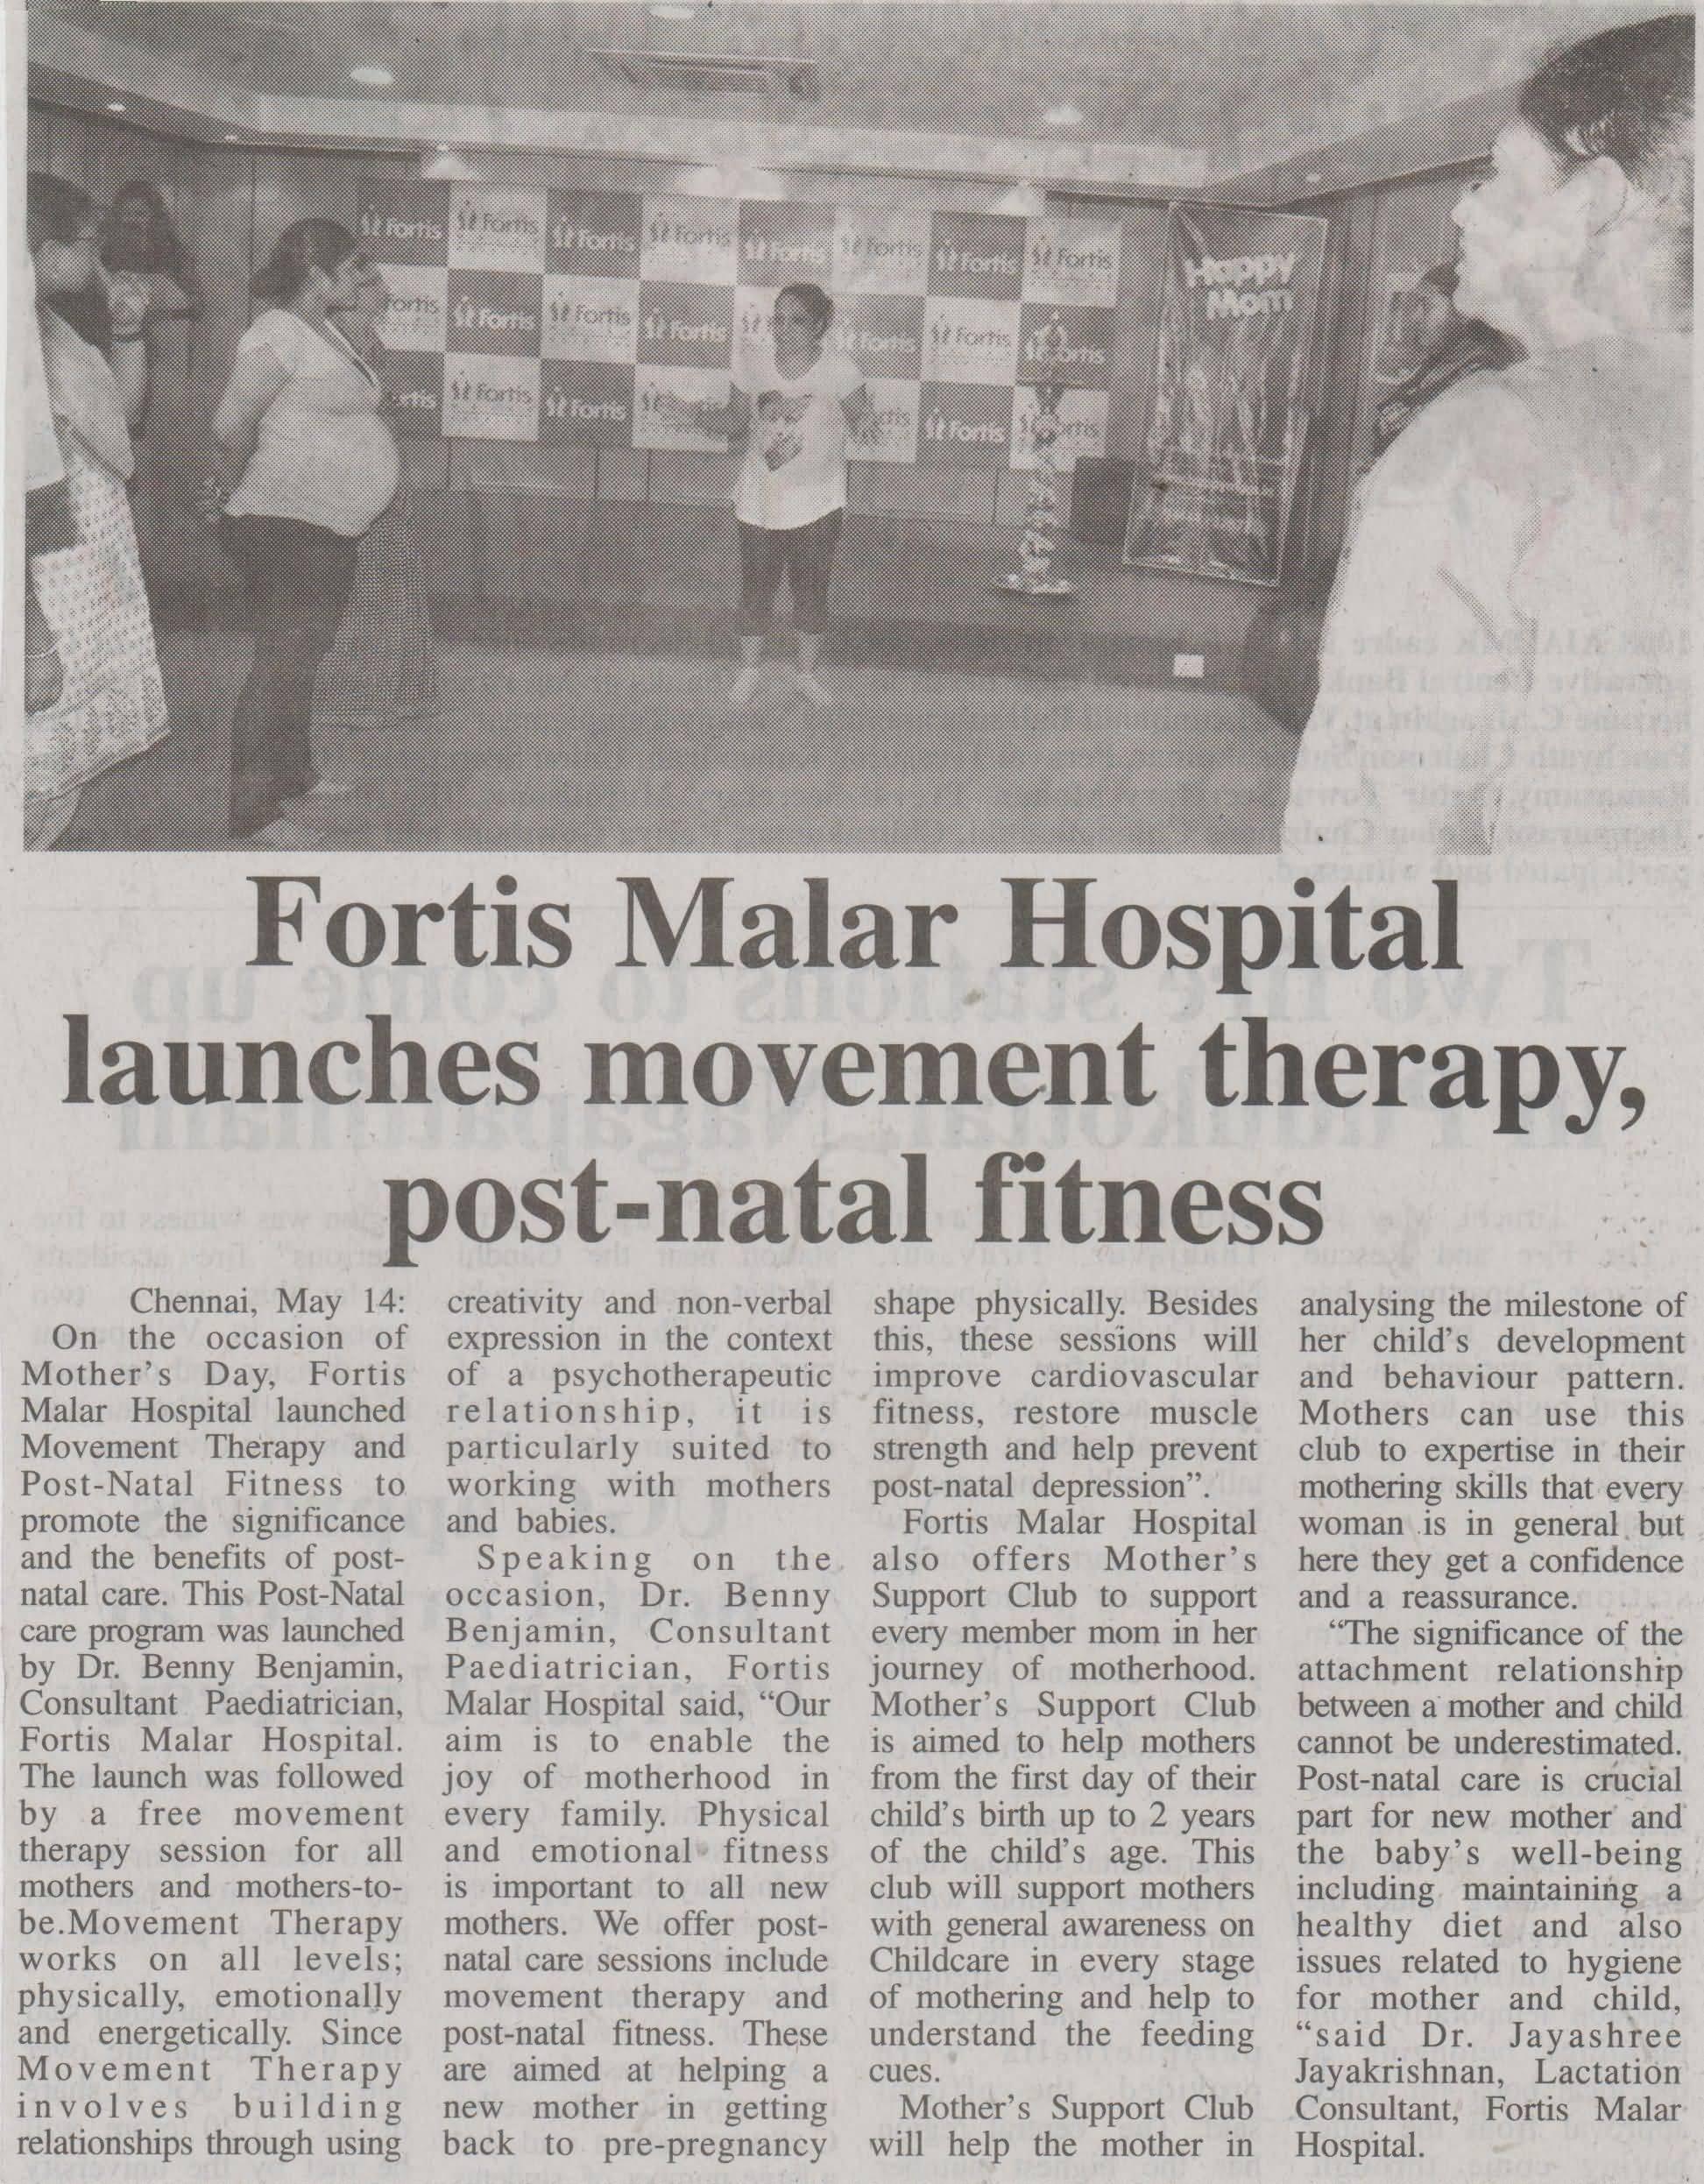 Trinity Mirror - 14.05.15 - Page 7 - Chennai